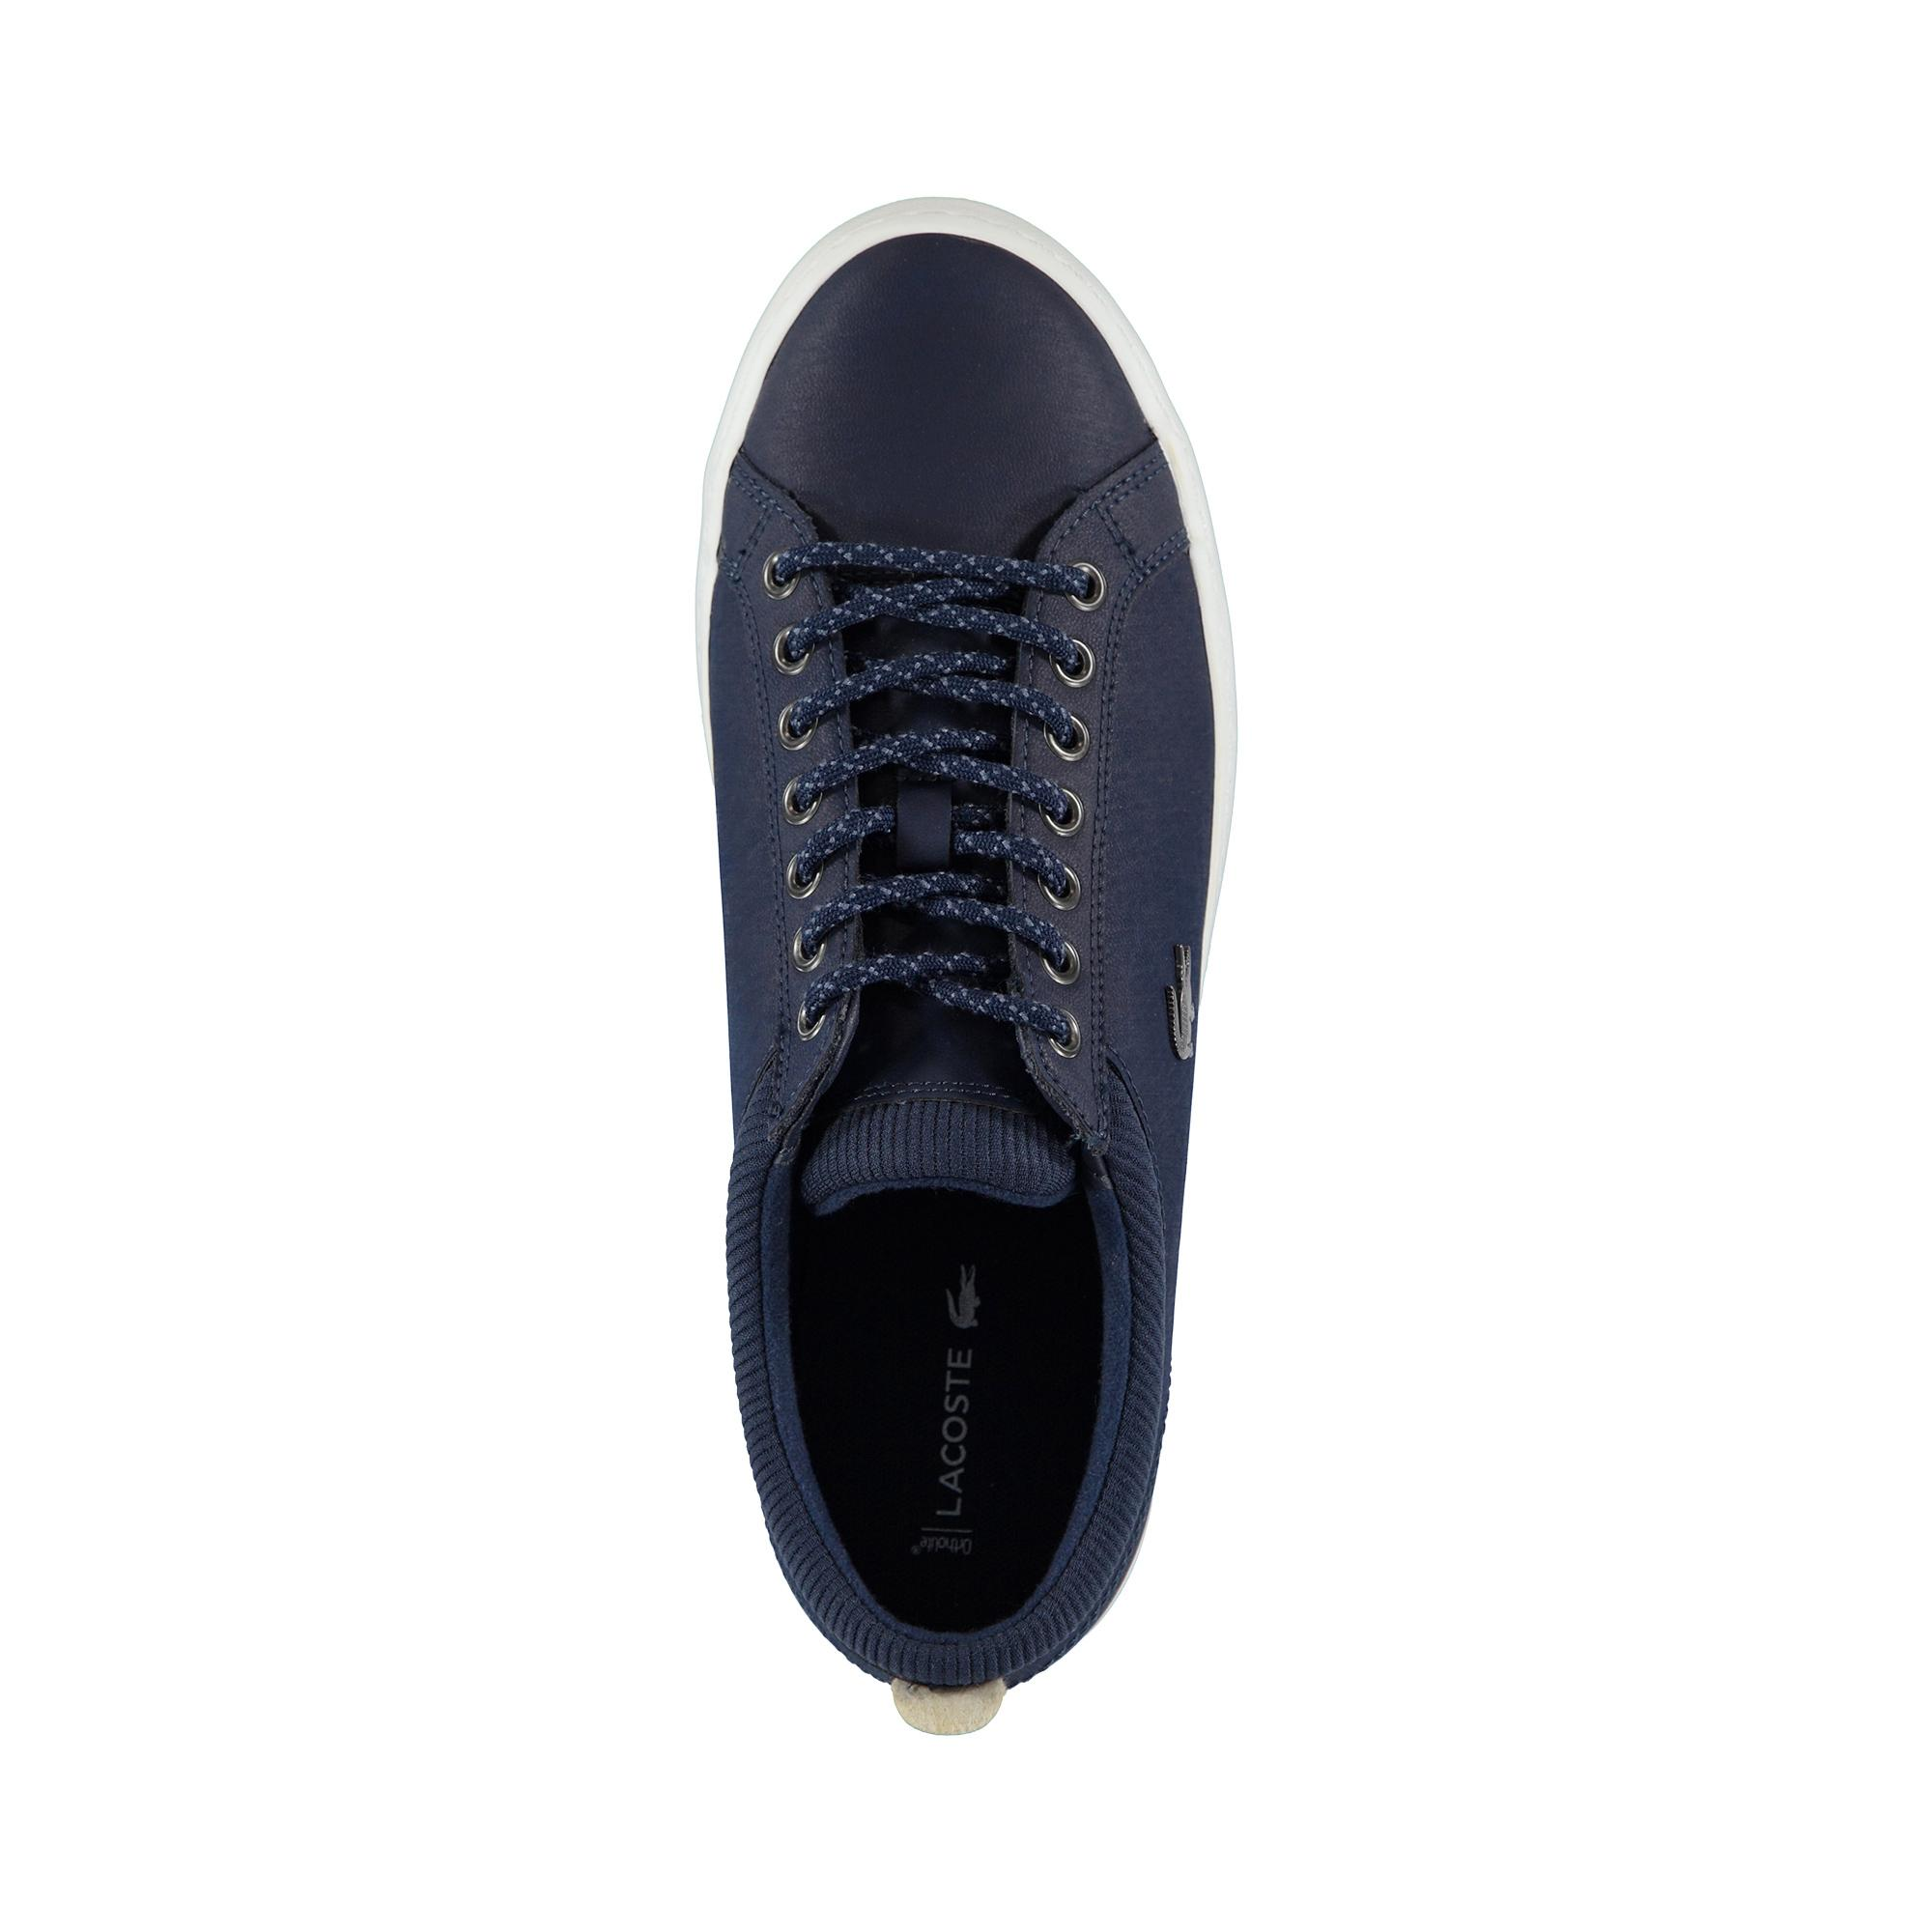 Lacoste Straightset Insulate 318 1 Męskie Sneakersy